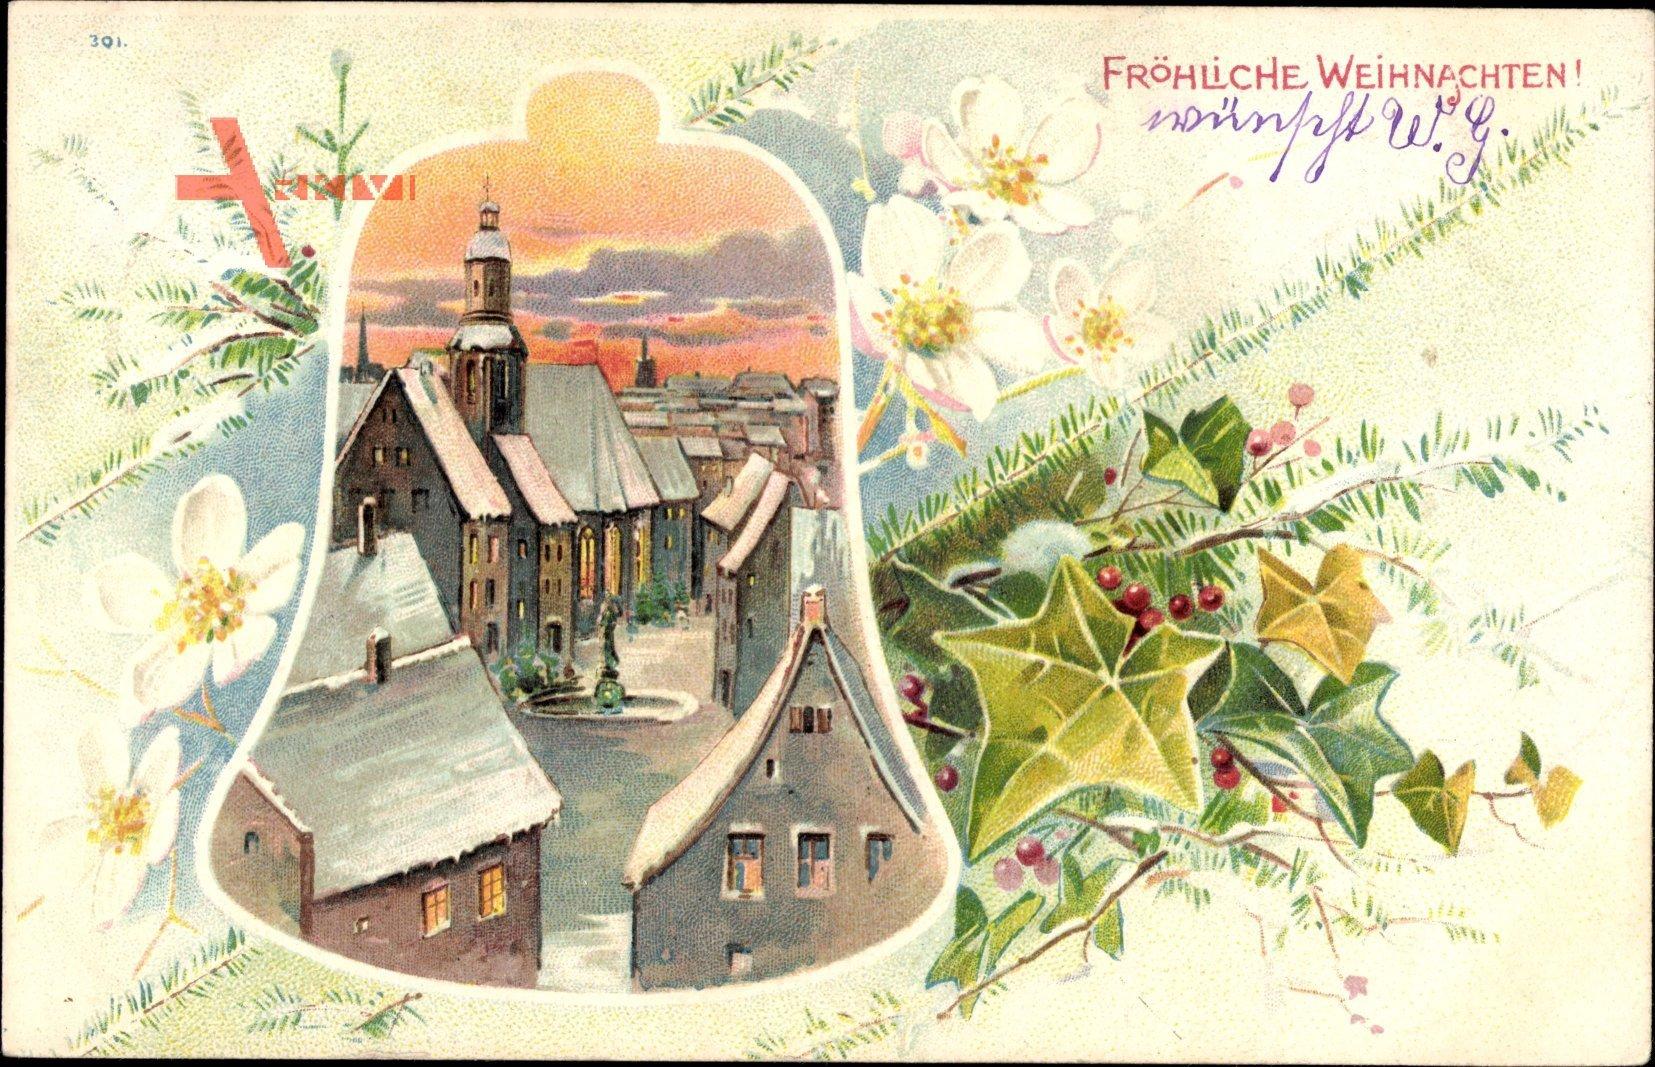 Passepartout Frohe Weihnachten, Ort im Schnee, Winteridyll